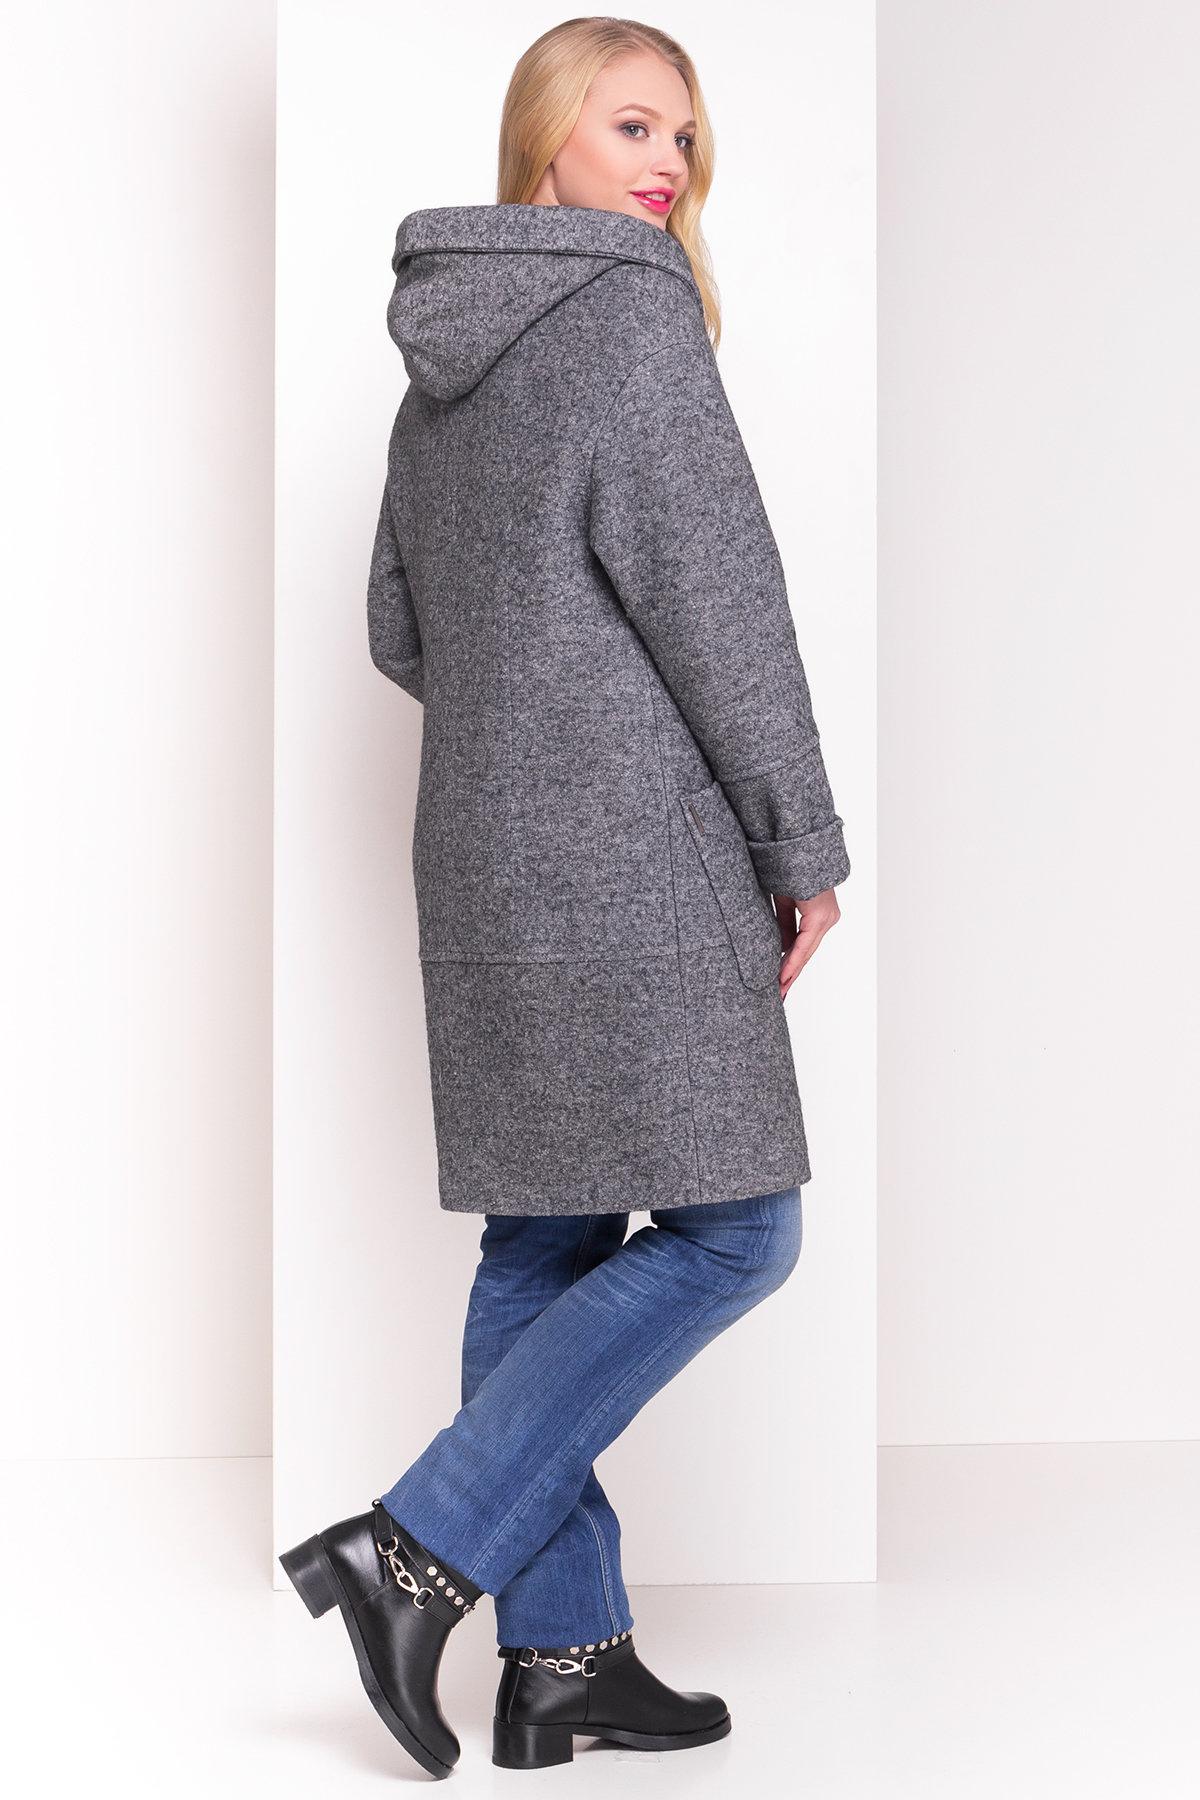 Пальто зима Анита Donna 3720 Цвет: Серый Темный LW-5